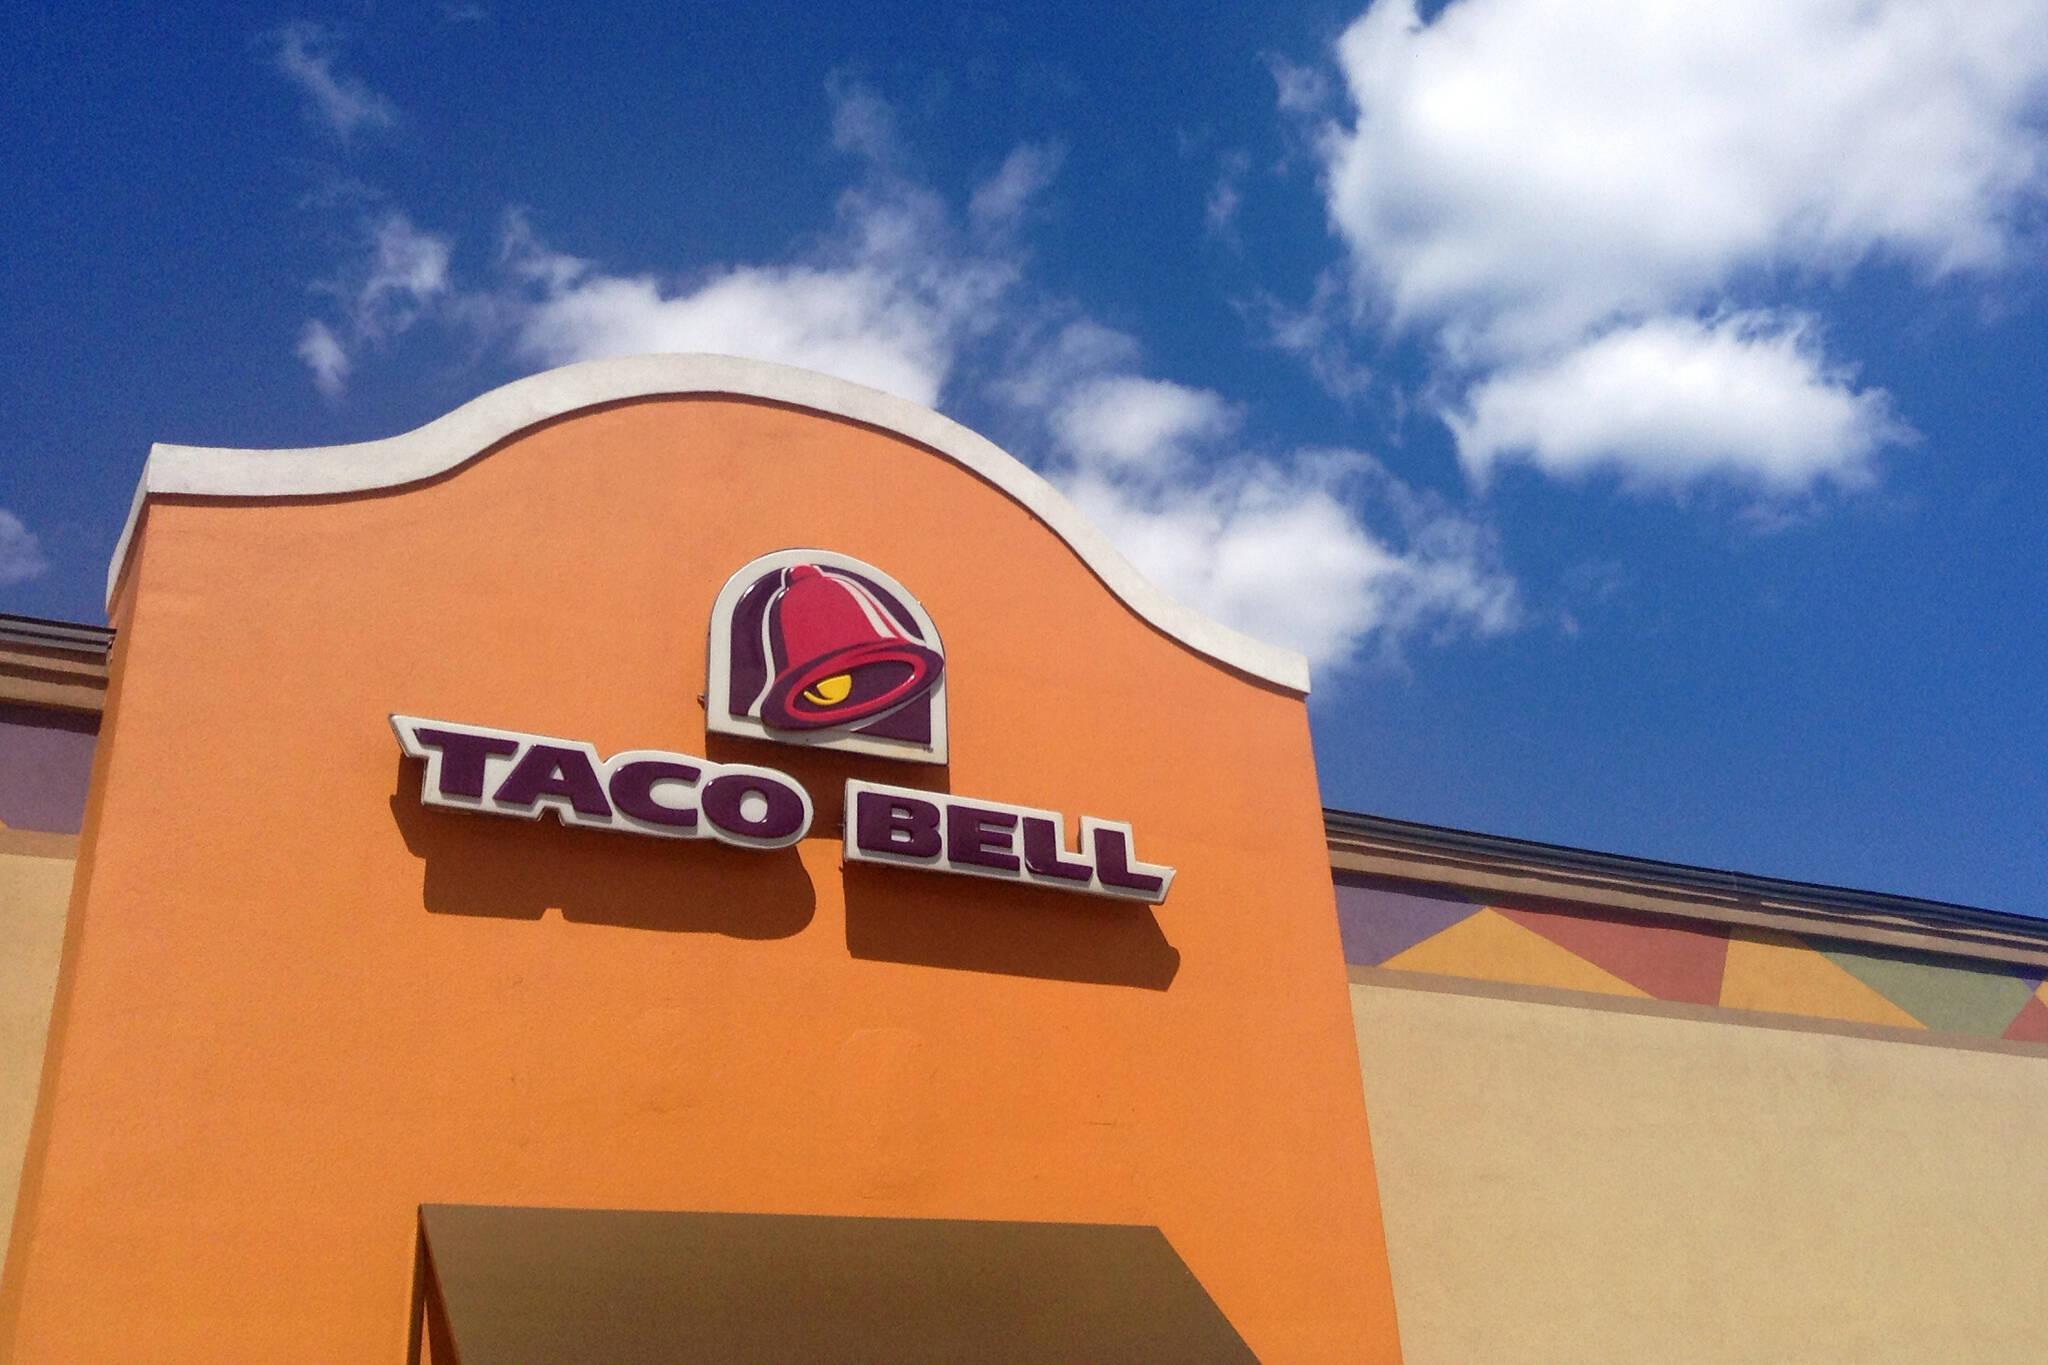 Taco Bell Drake